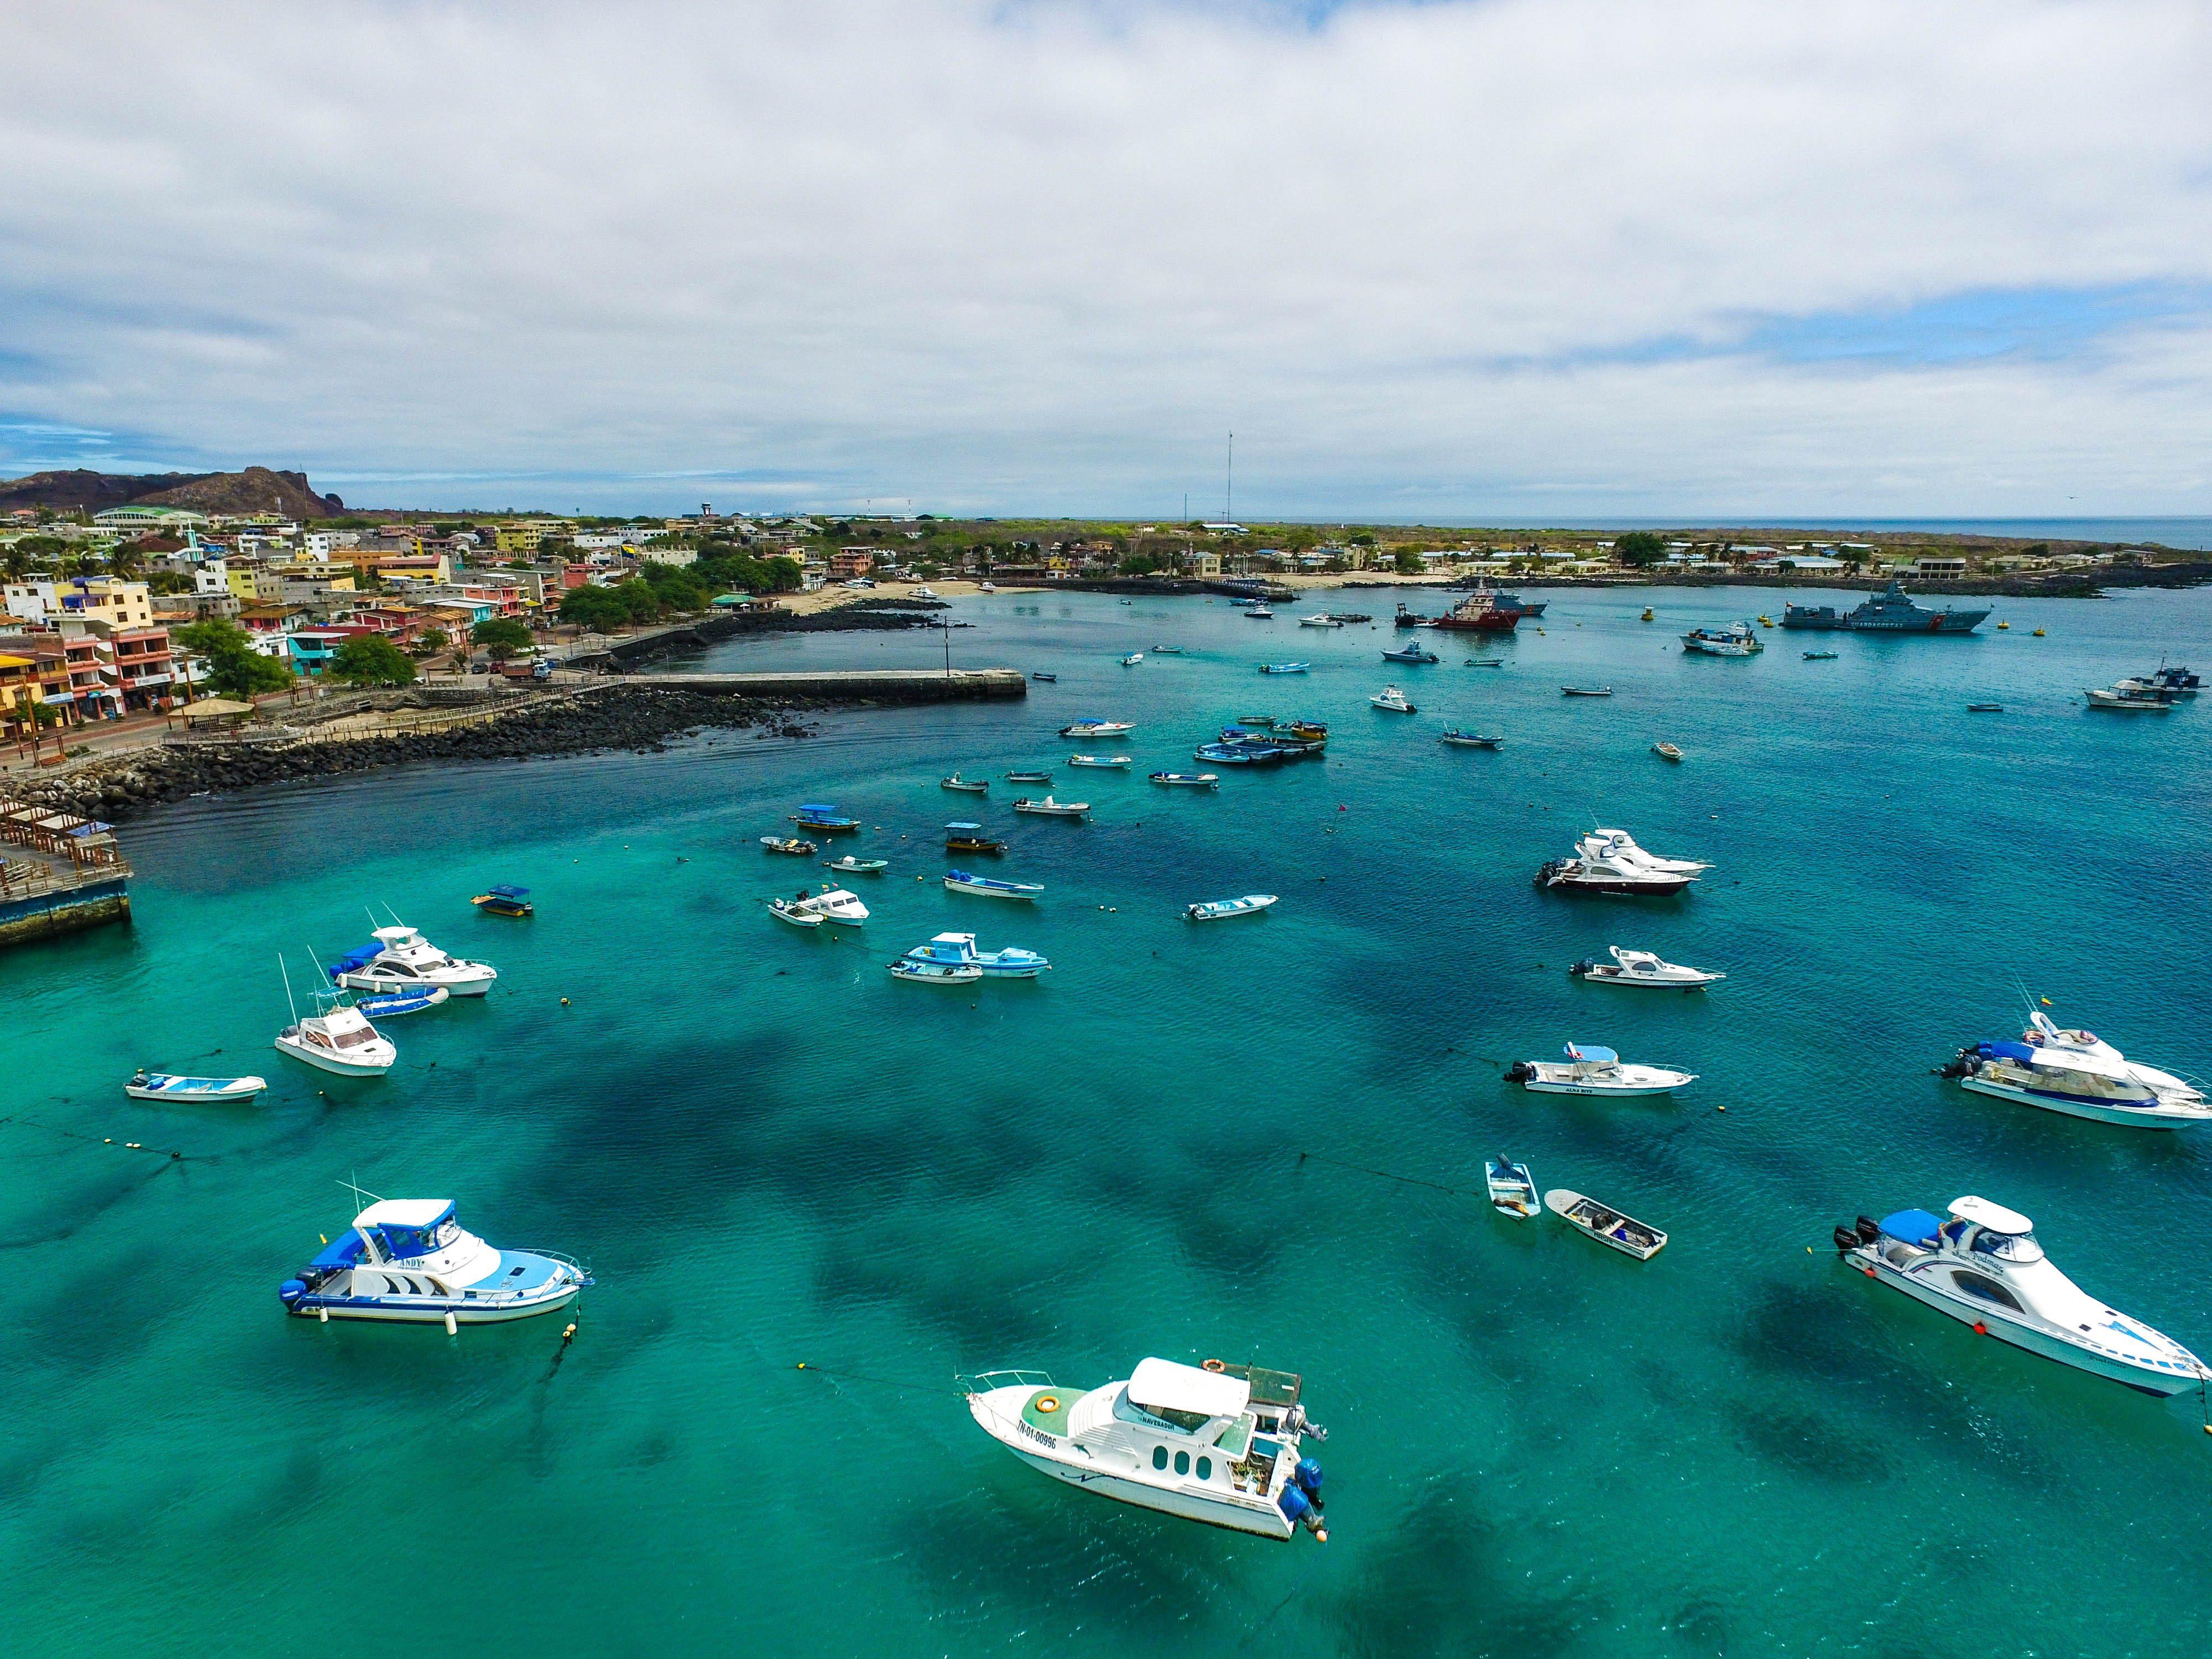 San Cristobal - Galapagos Islands, Ecuador. Aerial Shot